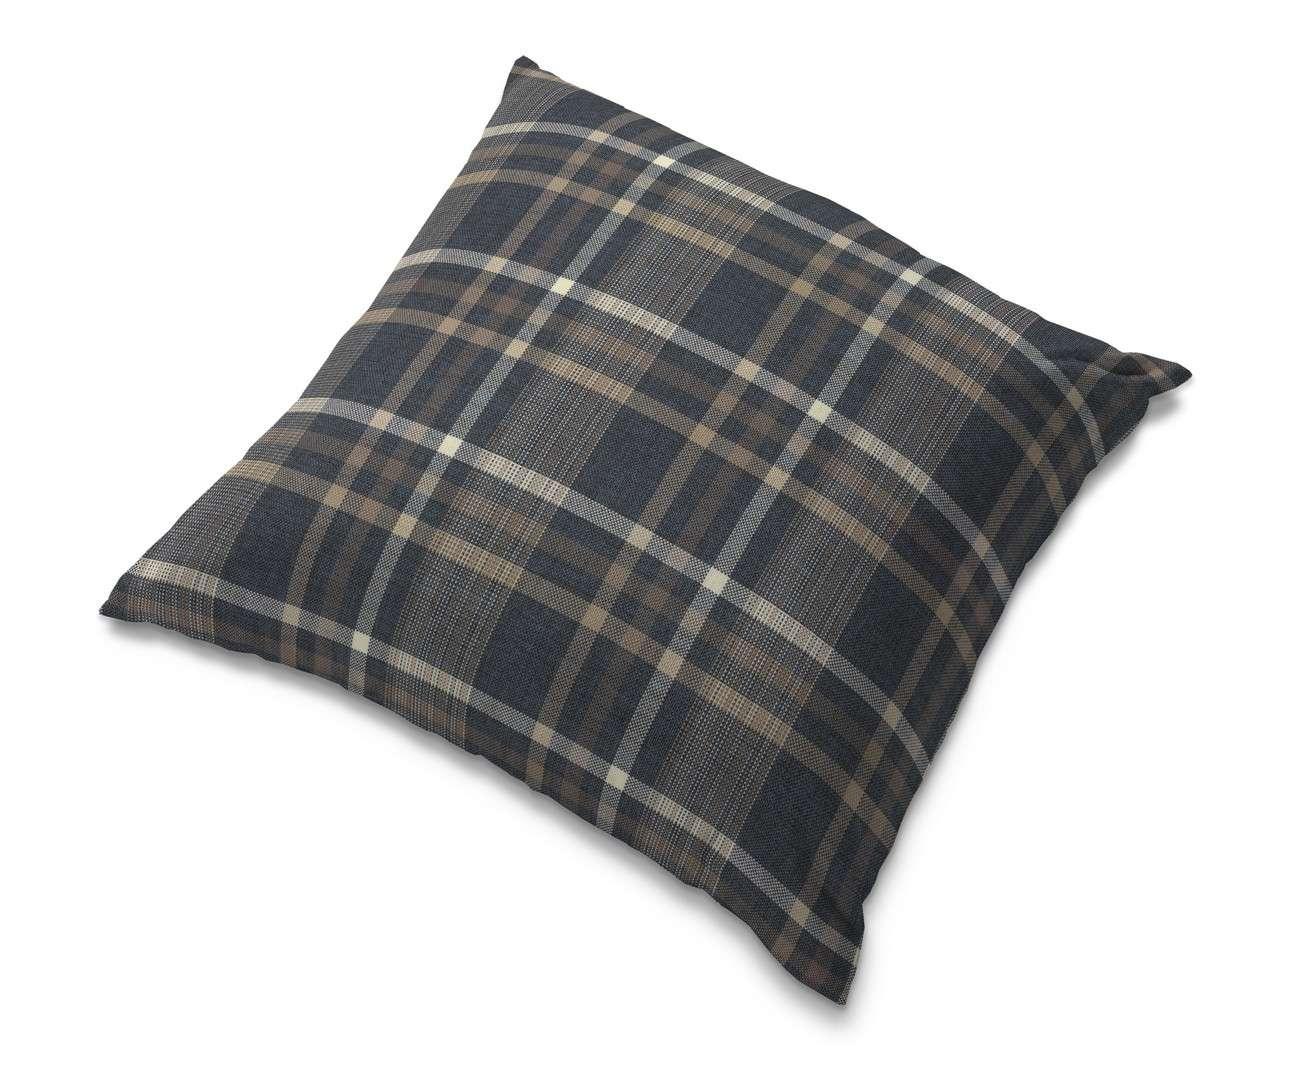 Poszewka Tomelilla 55x55cm w kolekcji Edinburgh, tkanina: 703-16